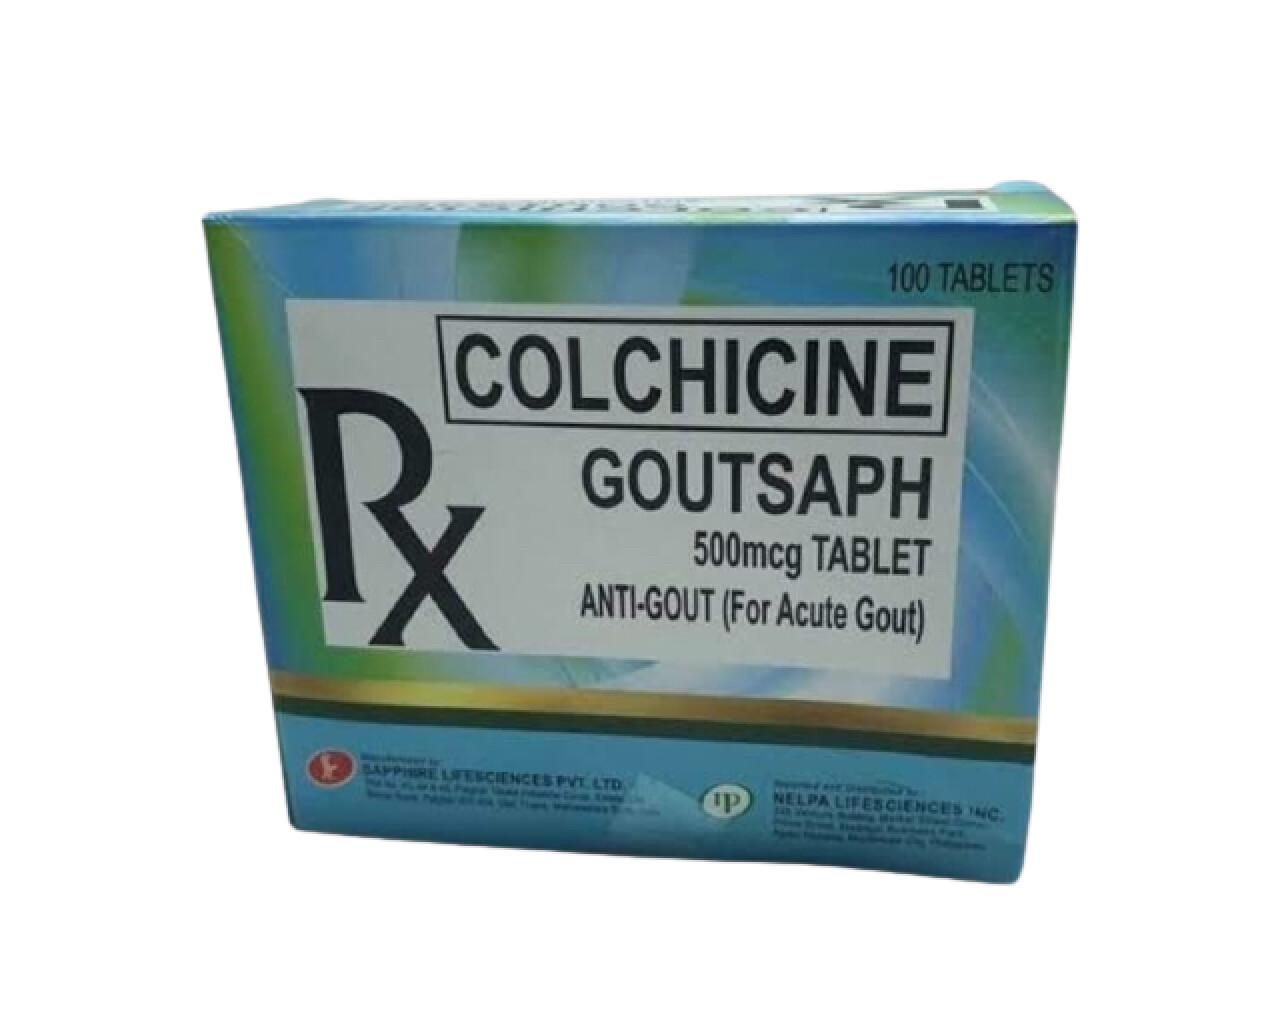 Colchicine 500mcg Tablet x 1's